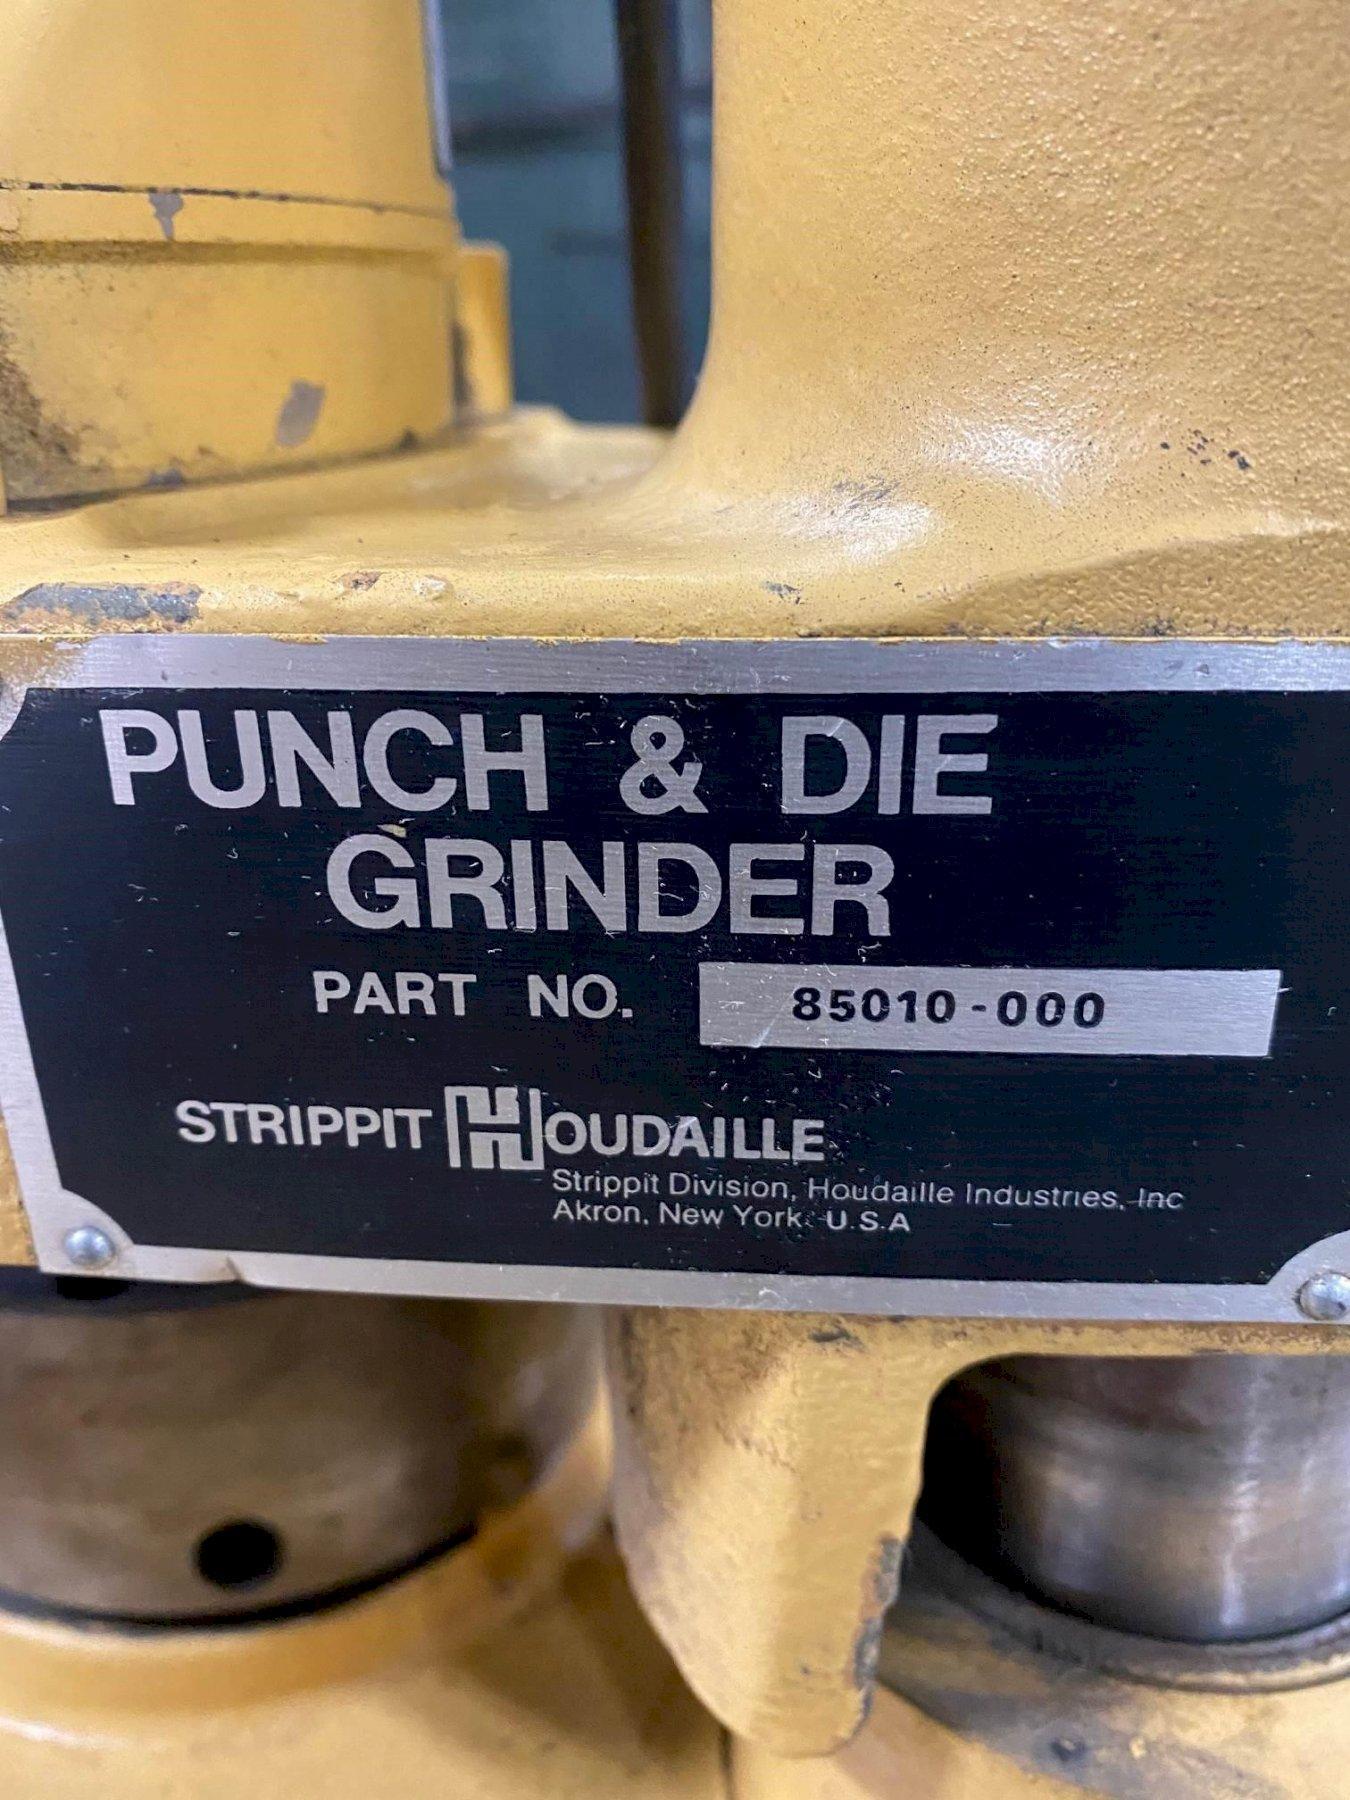 Strippit Portable Punch & Die Grinder, Model 85010-000